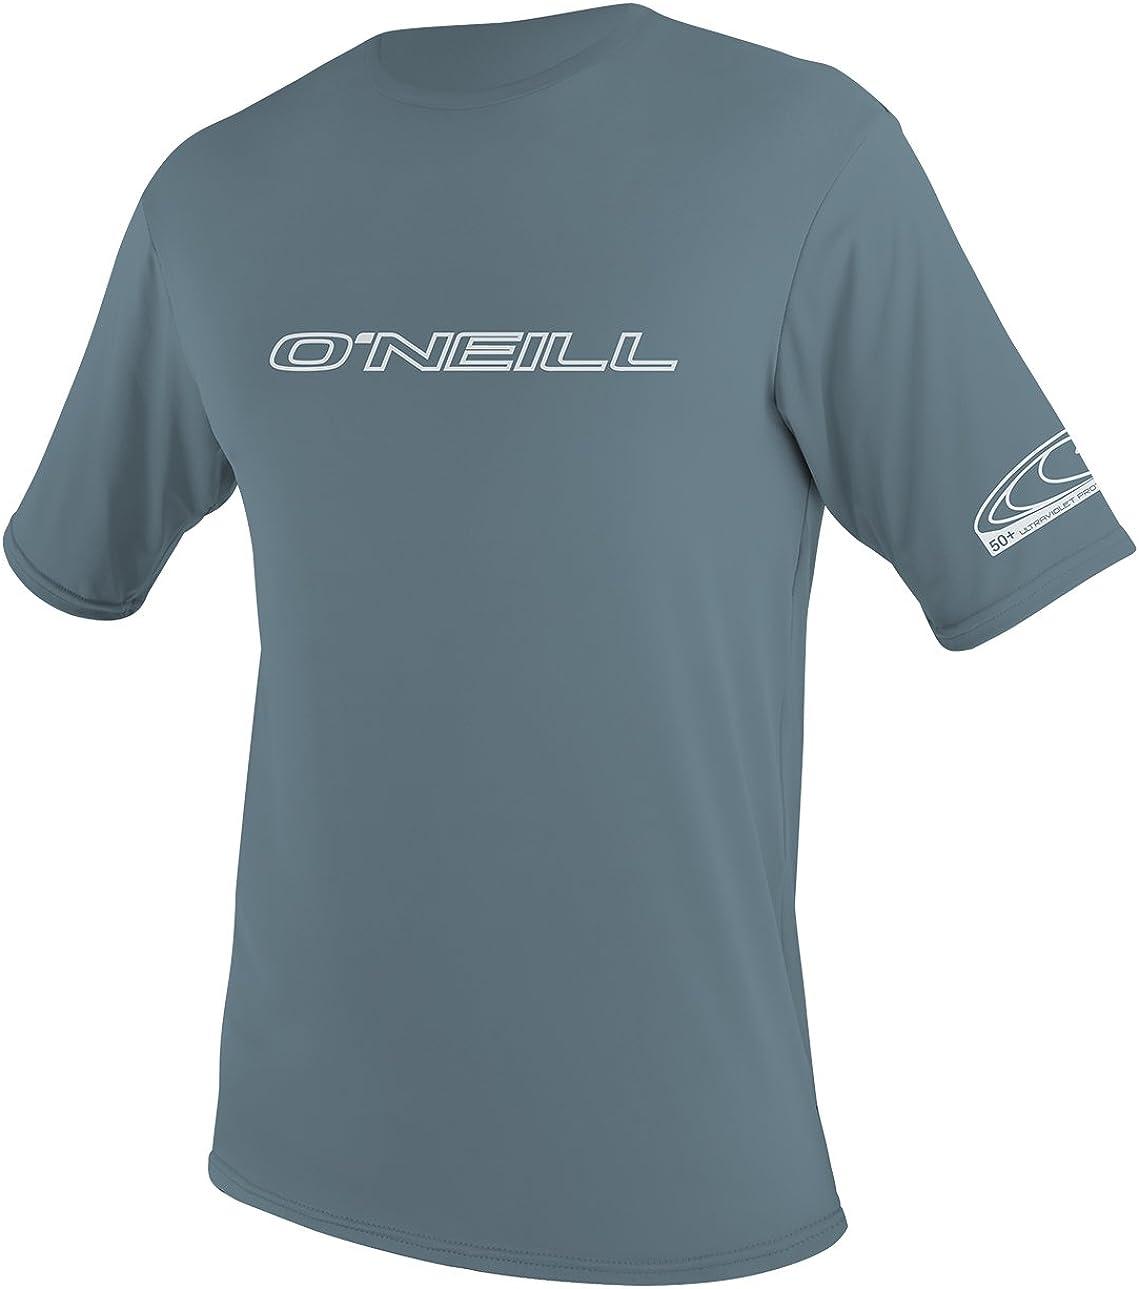 O'NeillMen's Basic Skins UPF 50+ Short Sleeve Sun Shirt